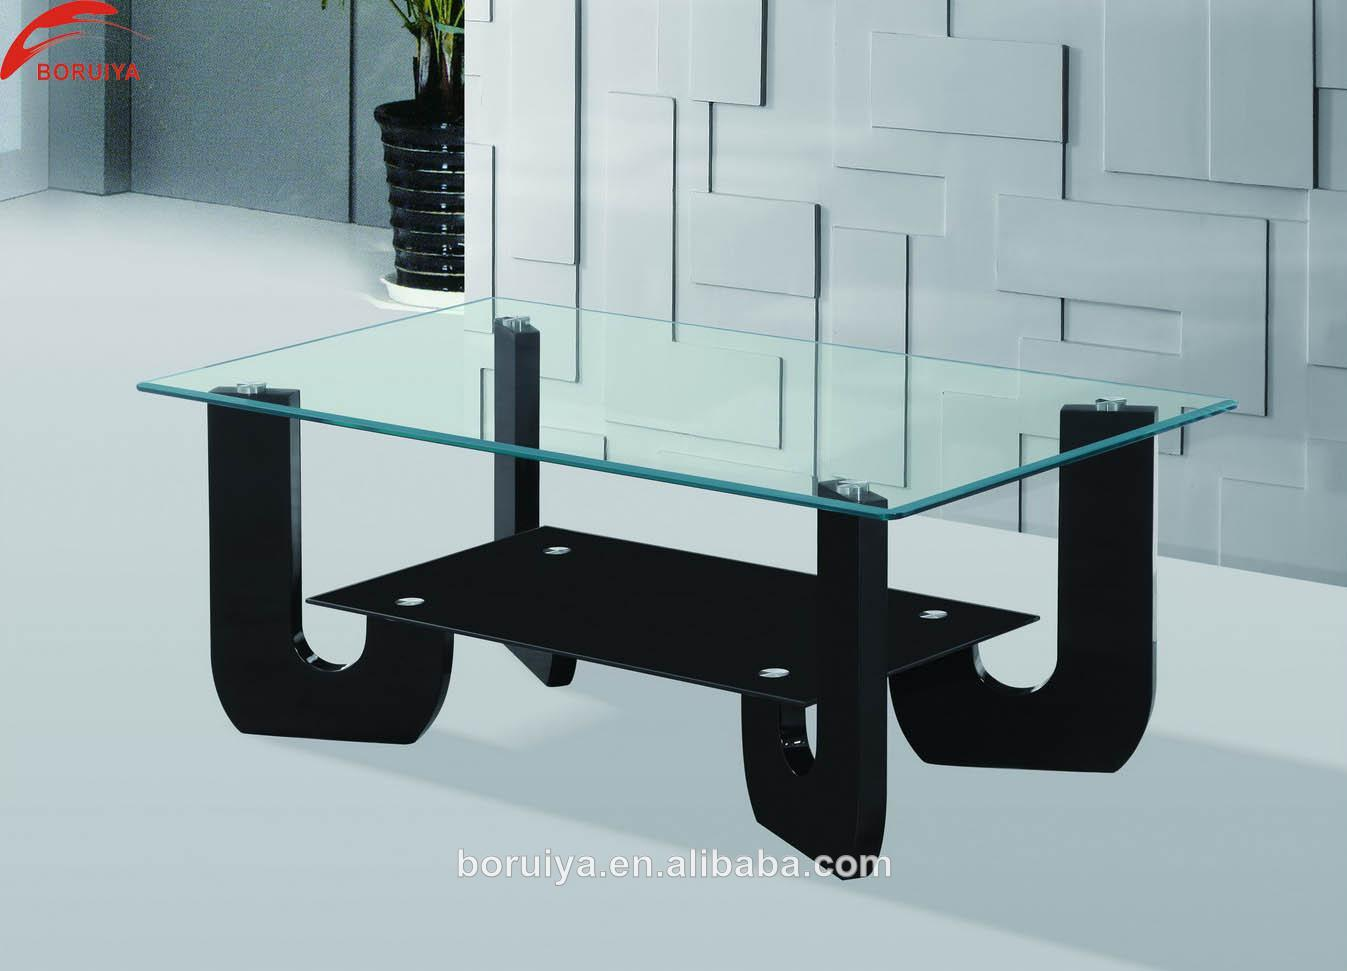 Black glass centre table designs for living room furniture for Table design glass